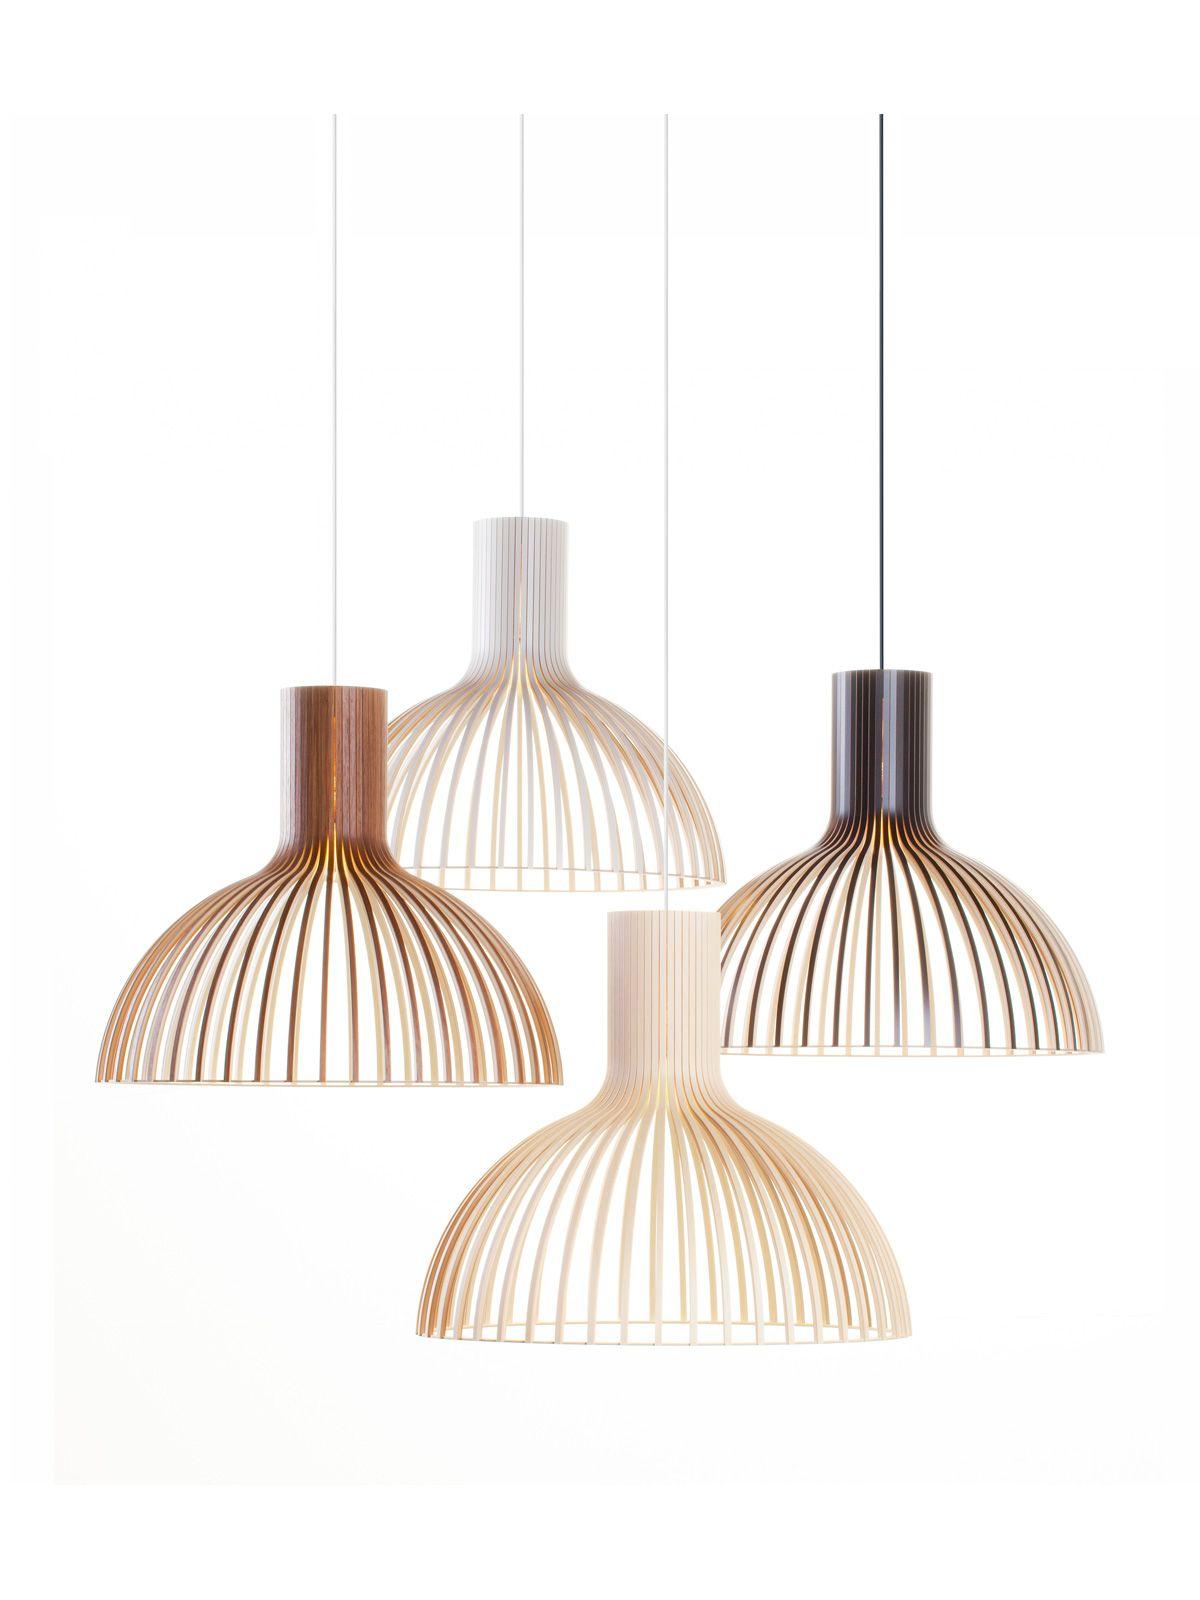 VICTO 4250 Secto Design Lamp Leuchte Scandinavian Skandinavisch